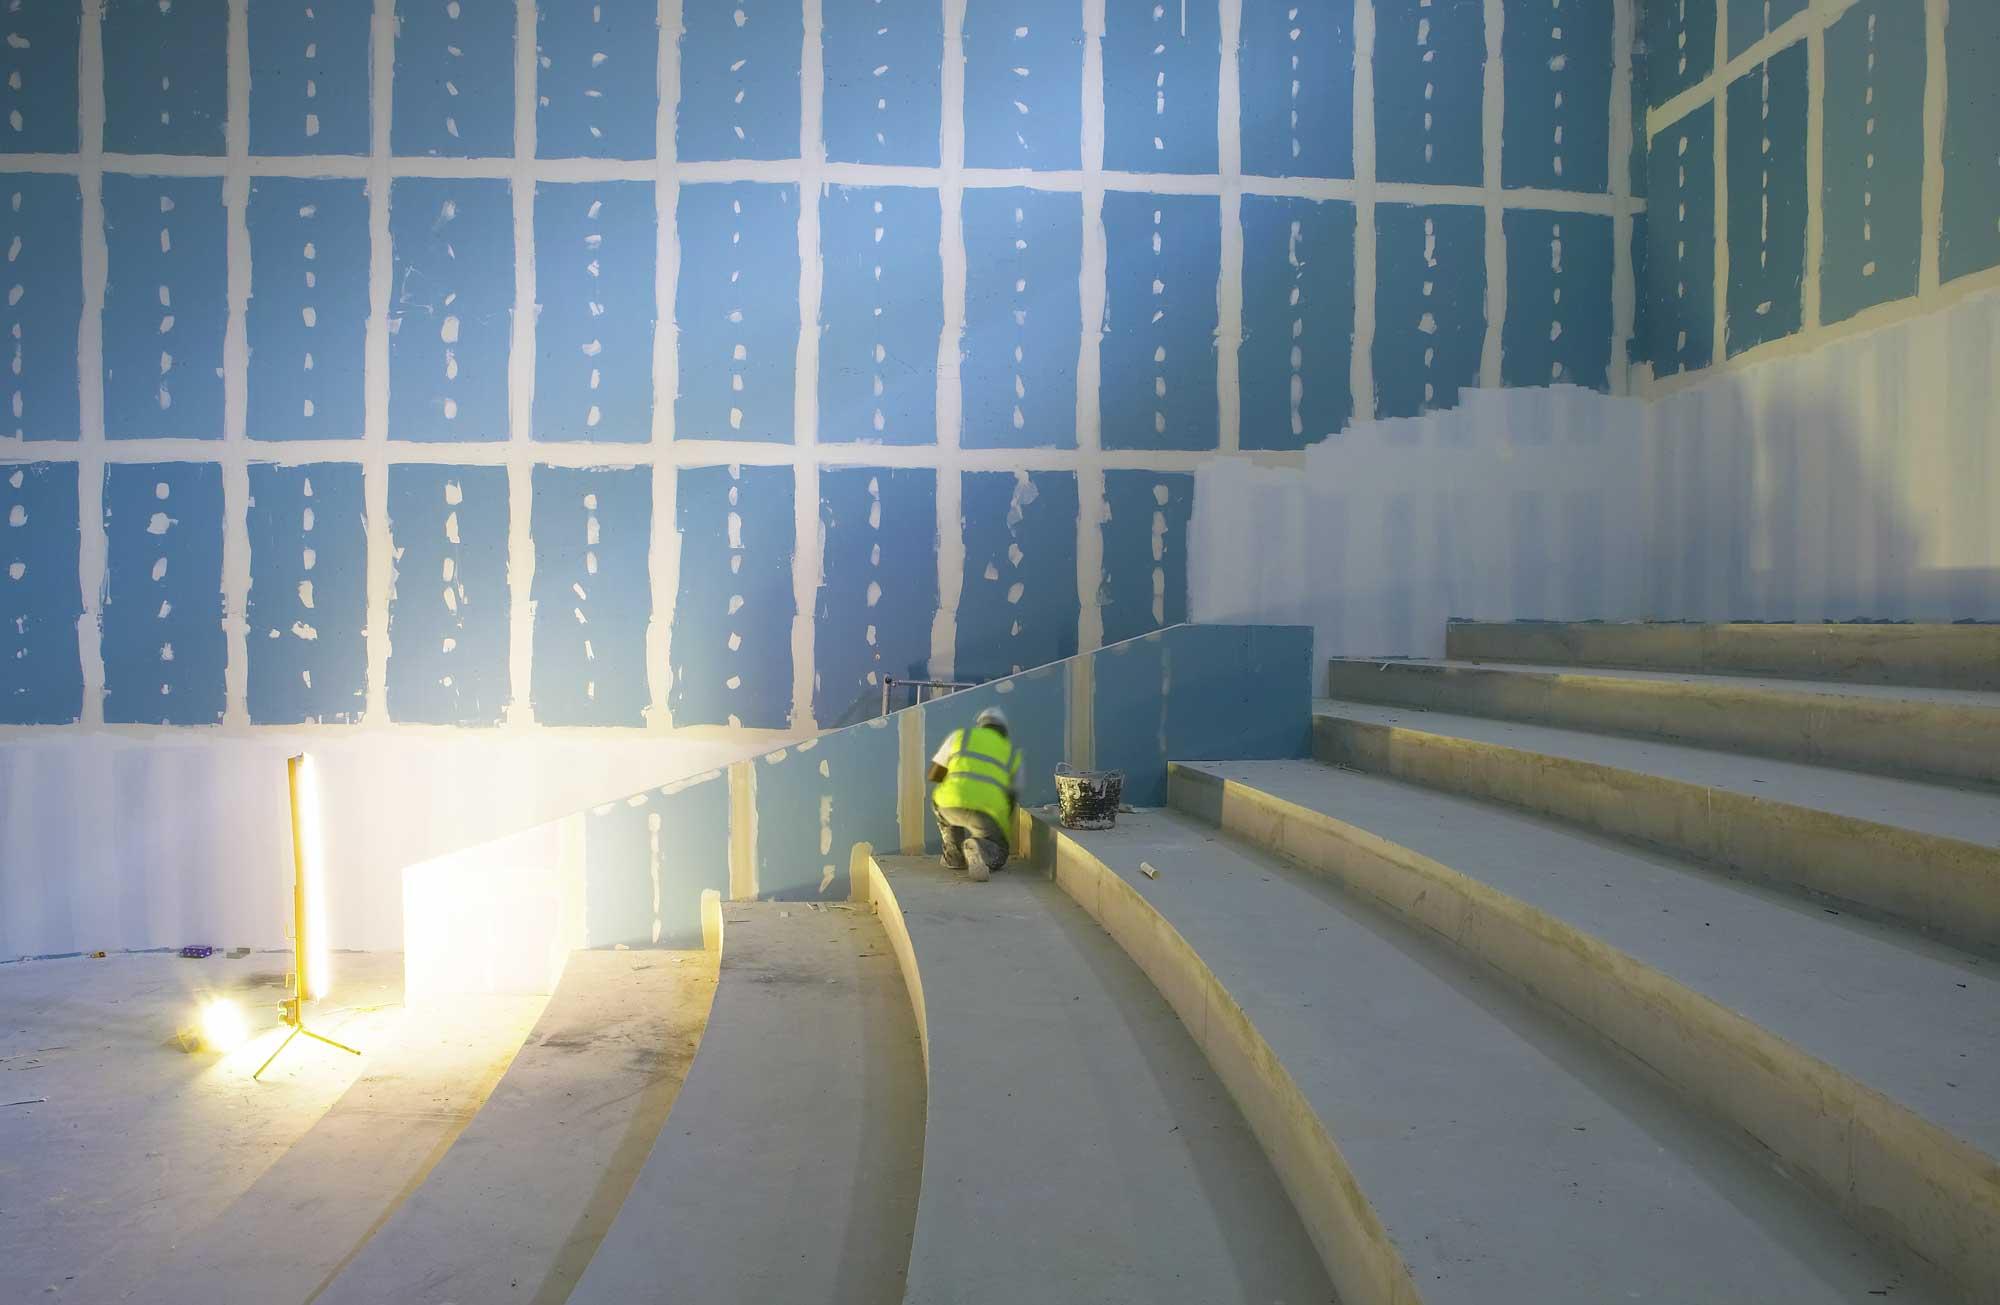 Cineworld at Eden, High Wycombe, Buckinghamshire | Construction Photographer | Construction Photography